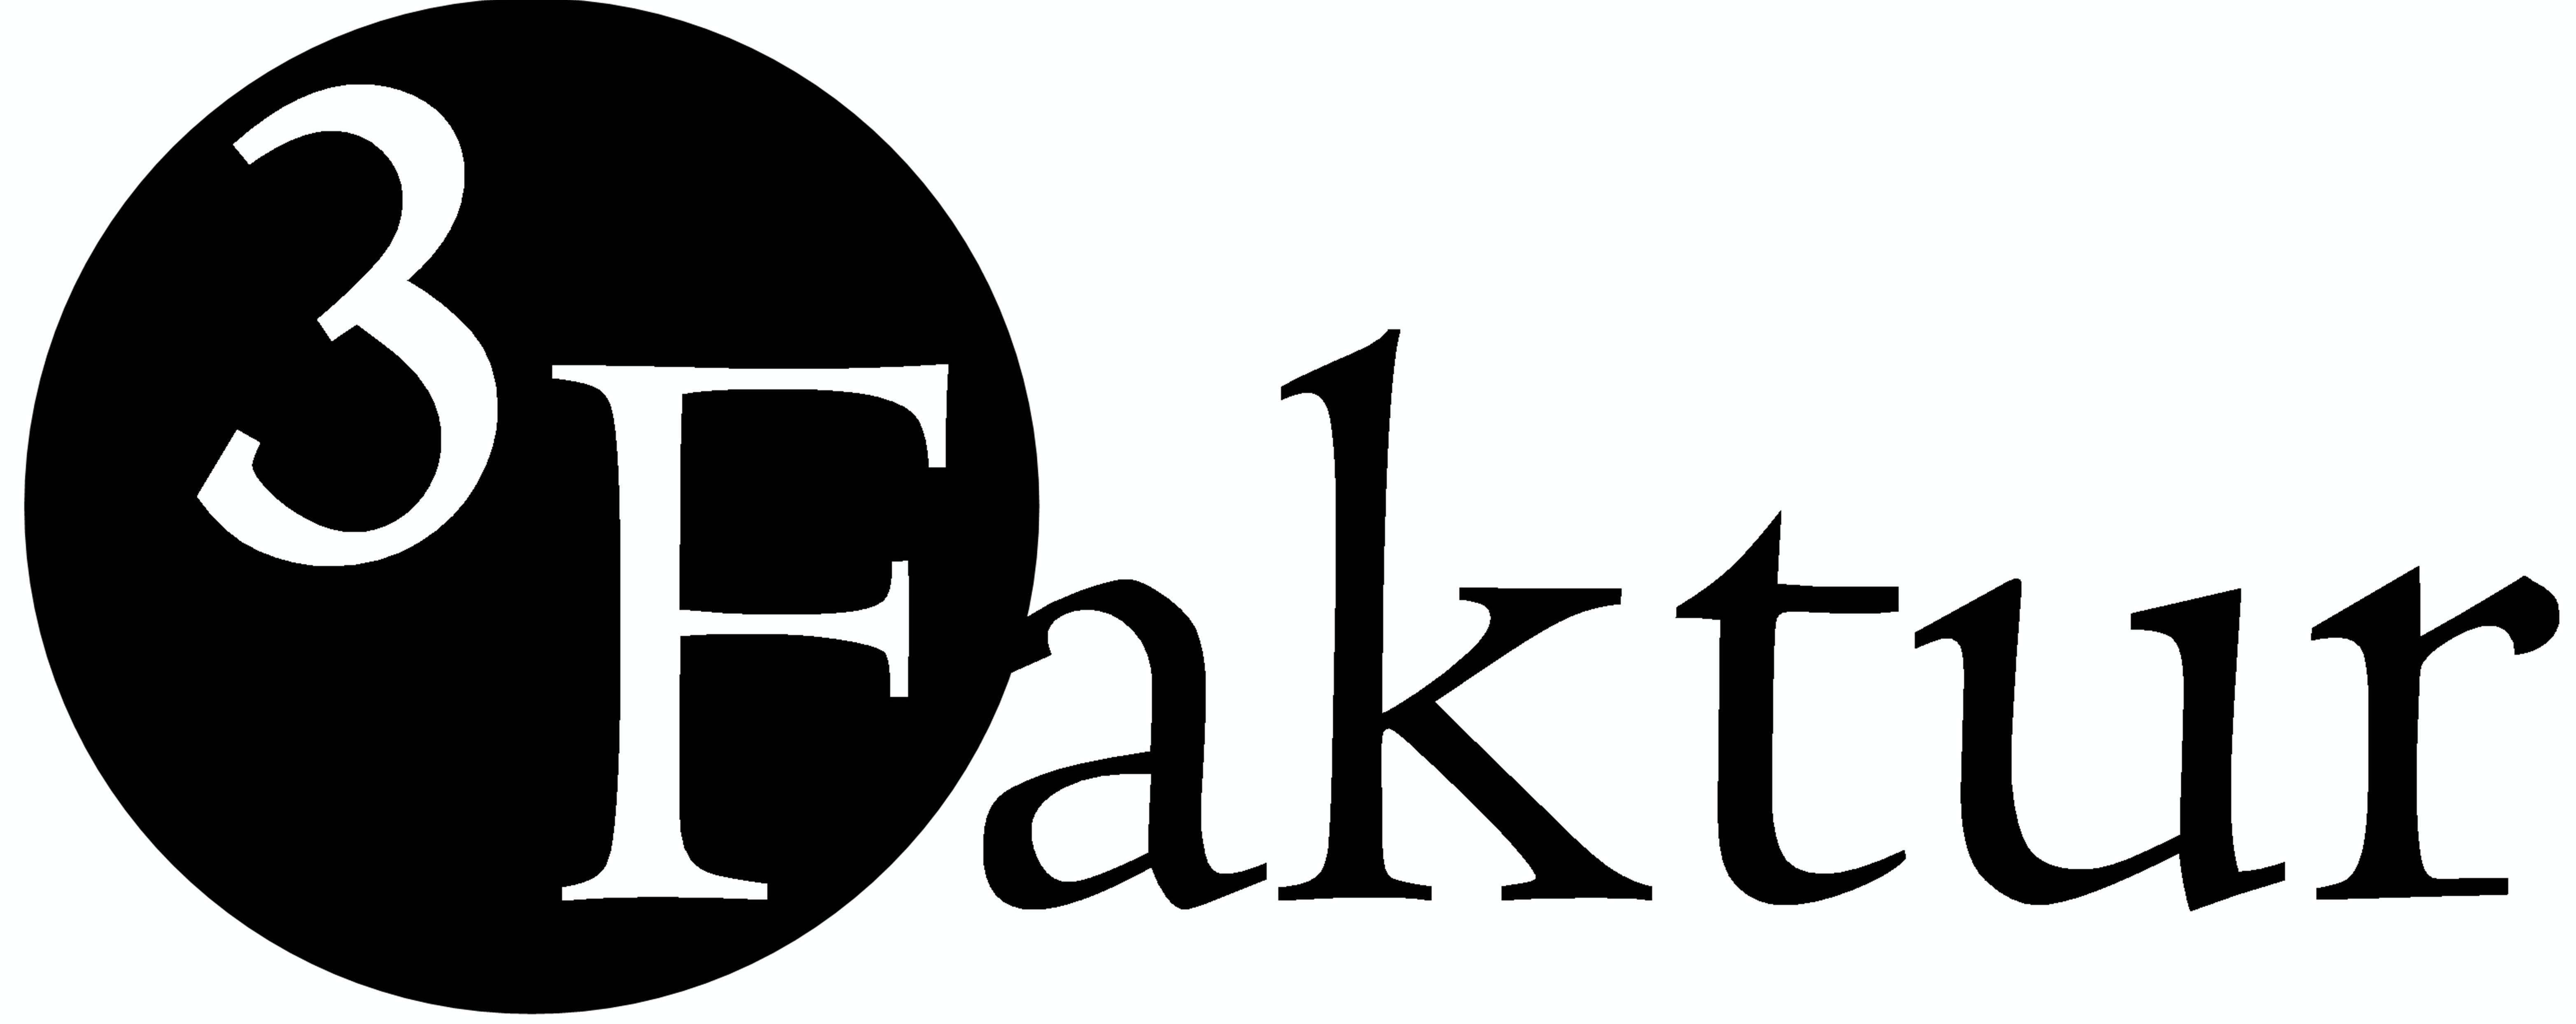 3Faktur GmbH